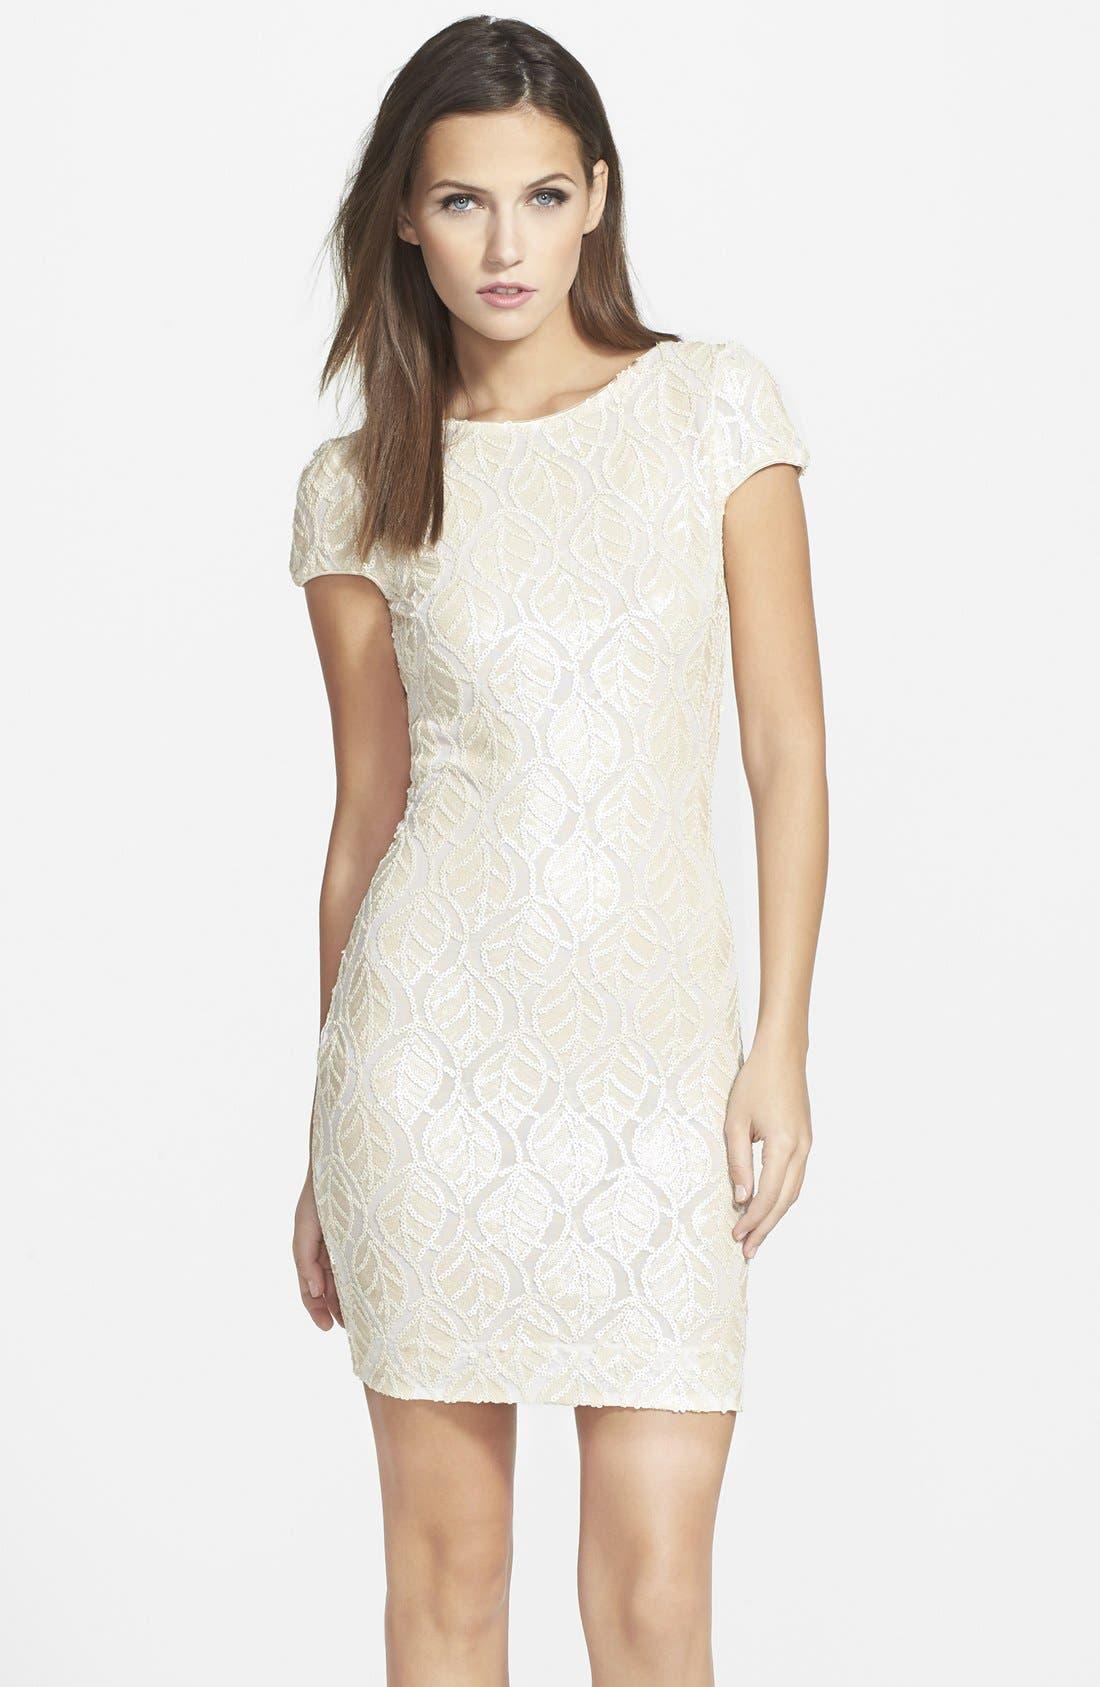 Alternate Image 1 Selected - Dress the Population 'Tabitha' Sequin Minidress